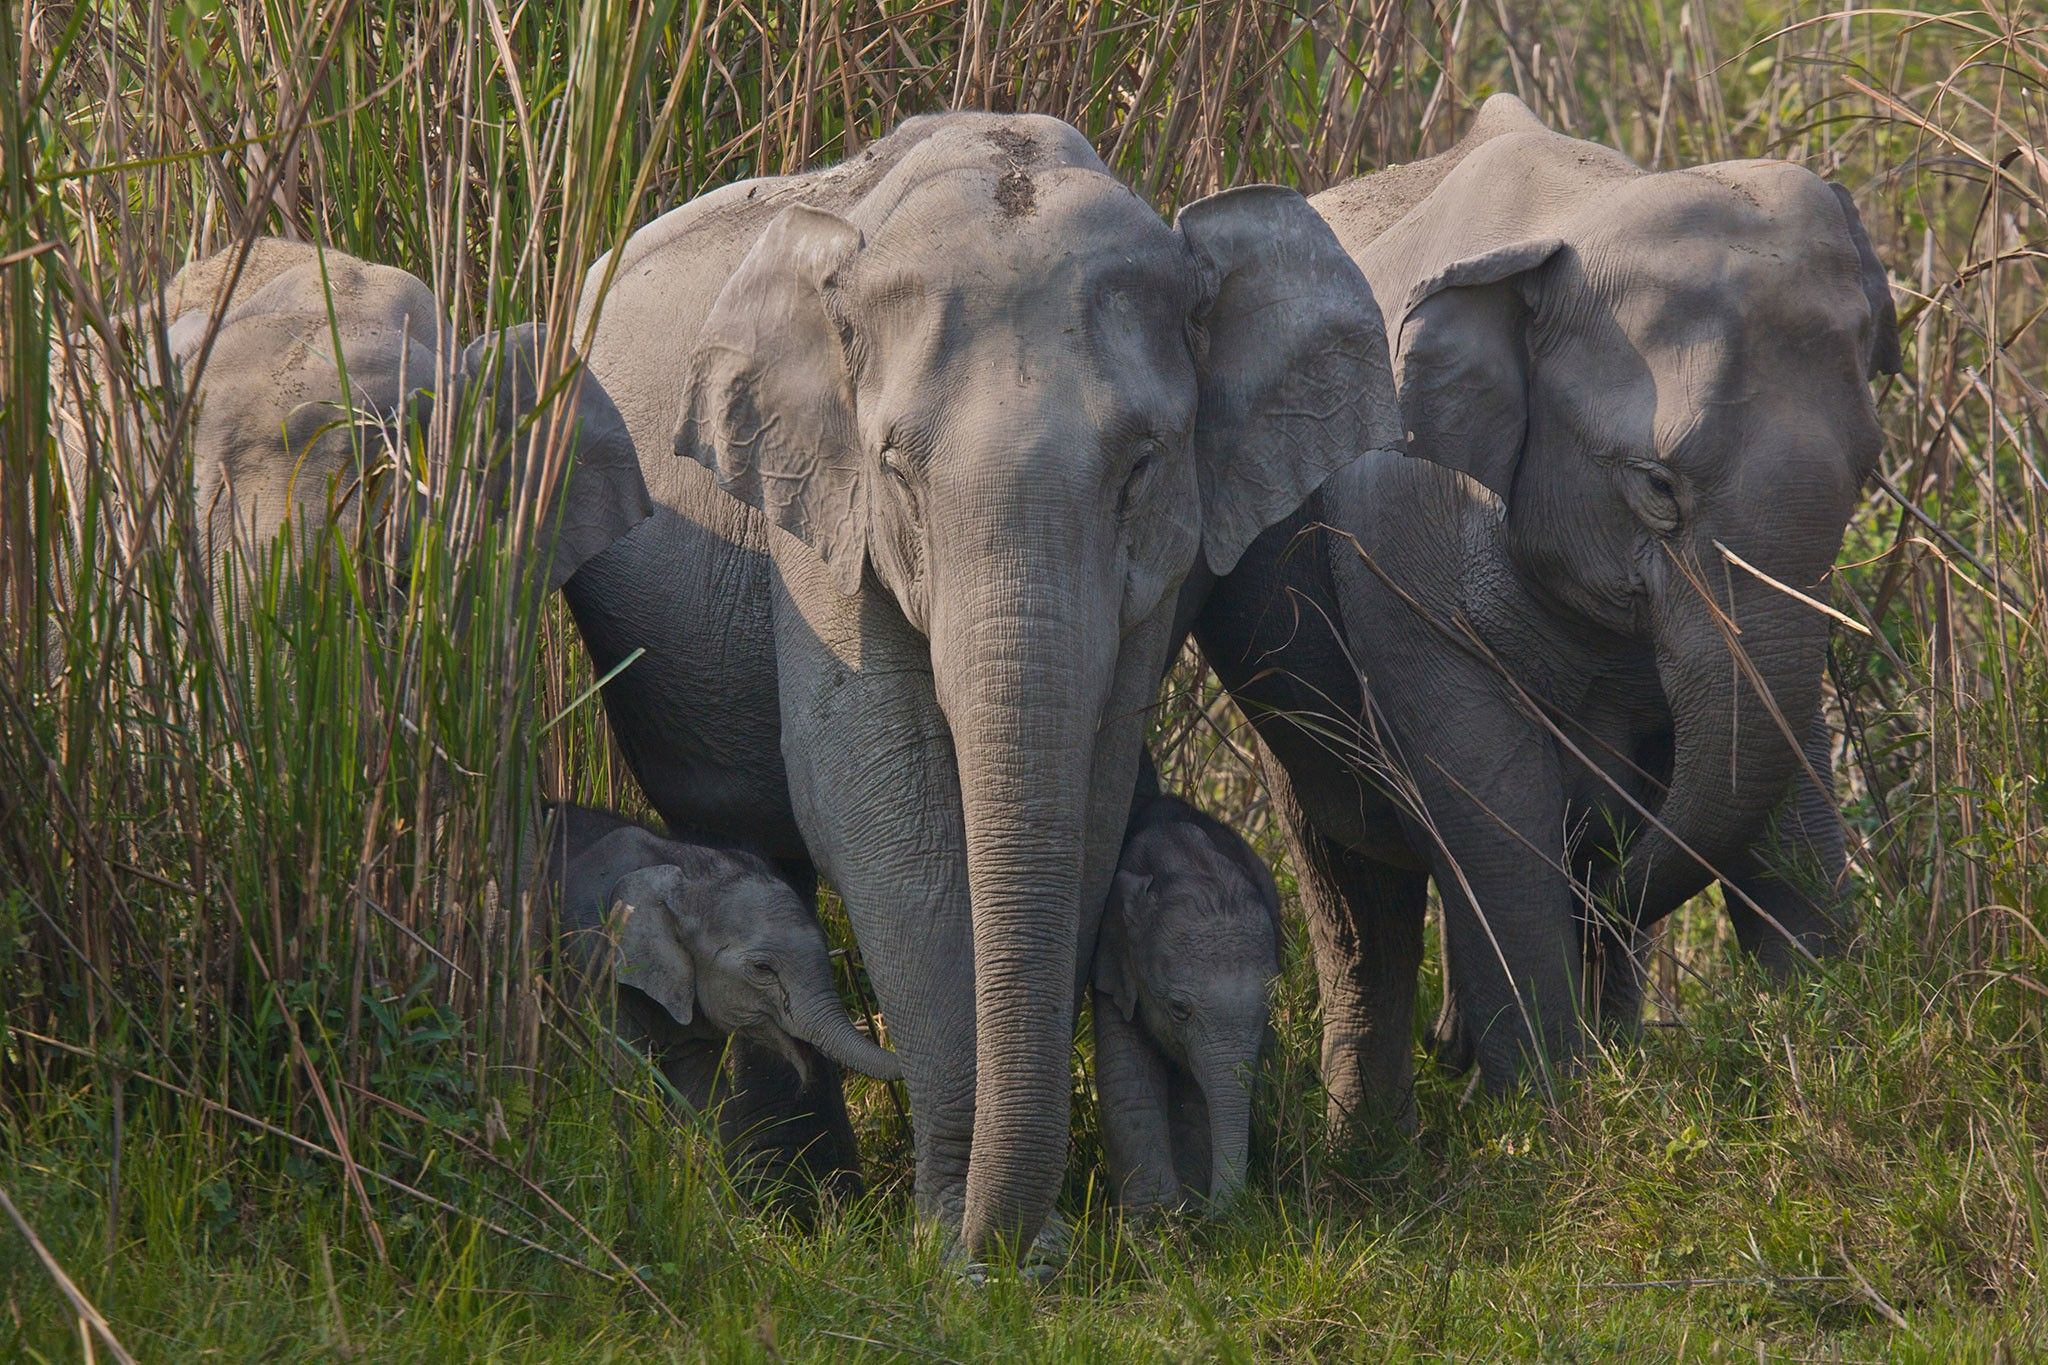 Elephant skin sales growing rapidly